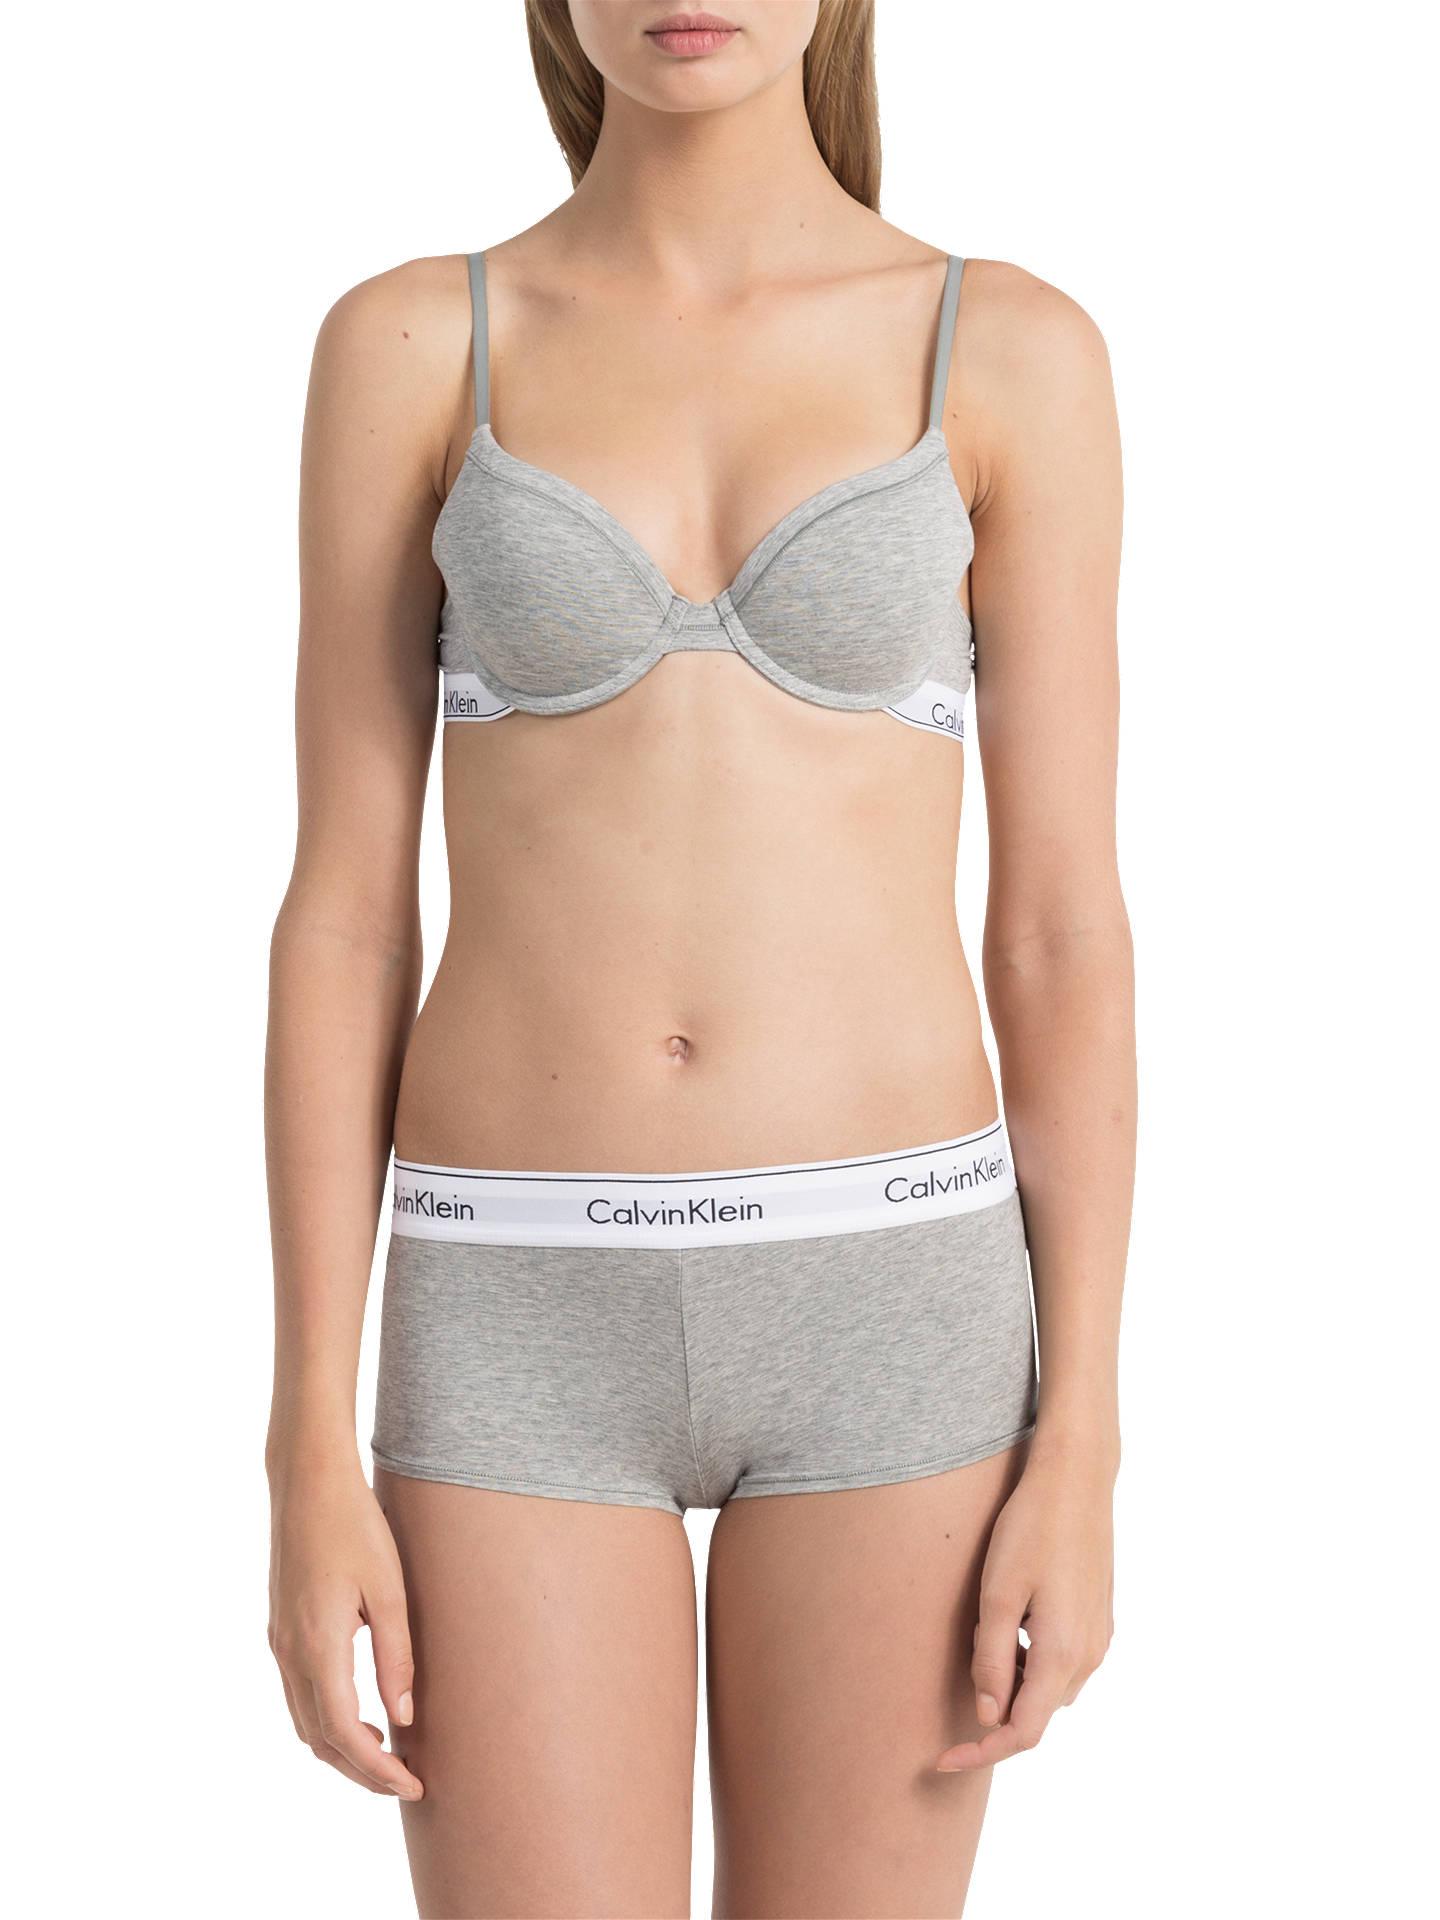 f3d69d9bdfb ... Buy Calvin Klein Underwear Modern Cotton T-Shirt Bra